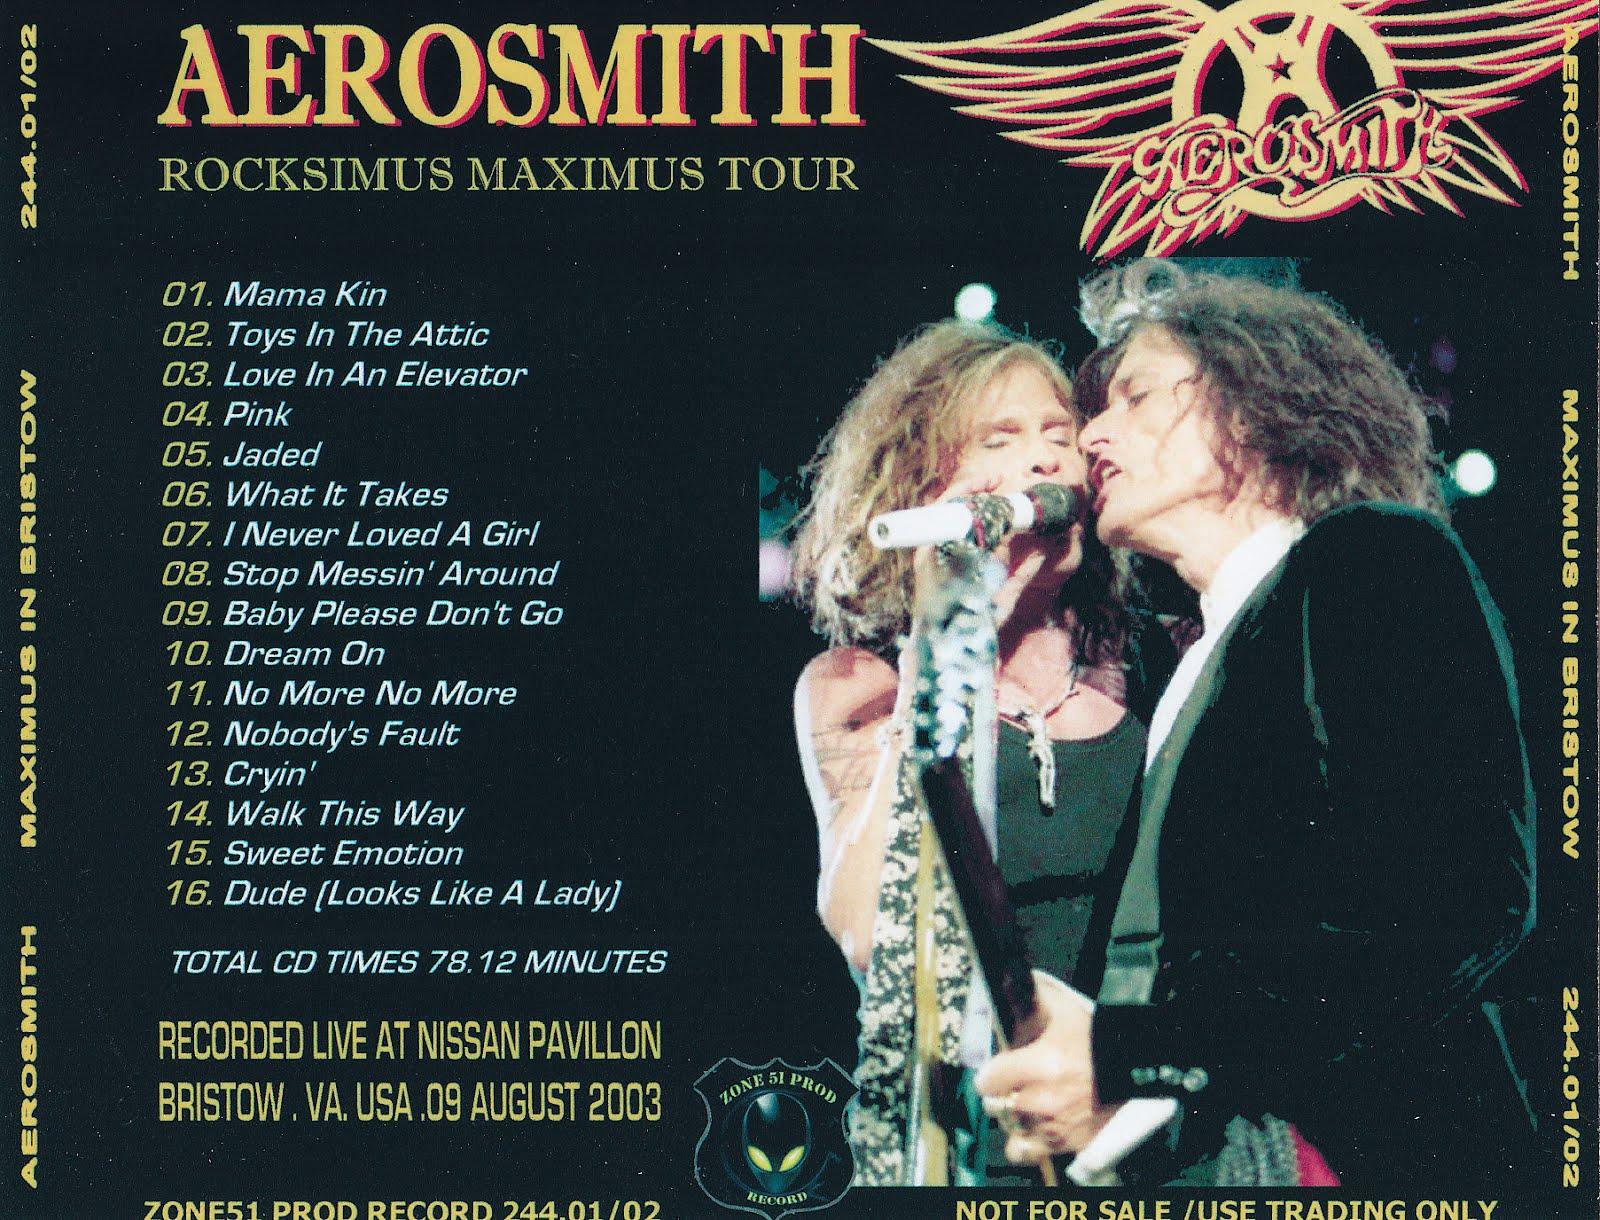 Aerosmith Bootlegs Cover Arts Maximus In Bristow 2003